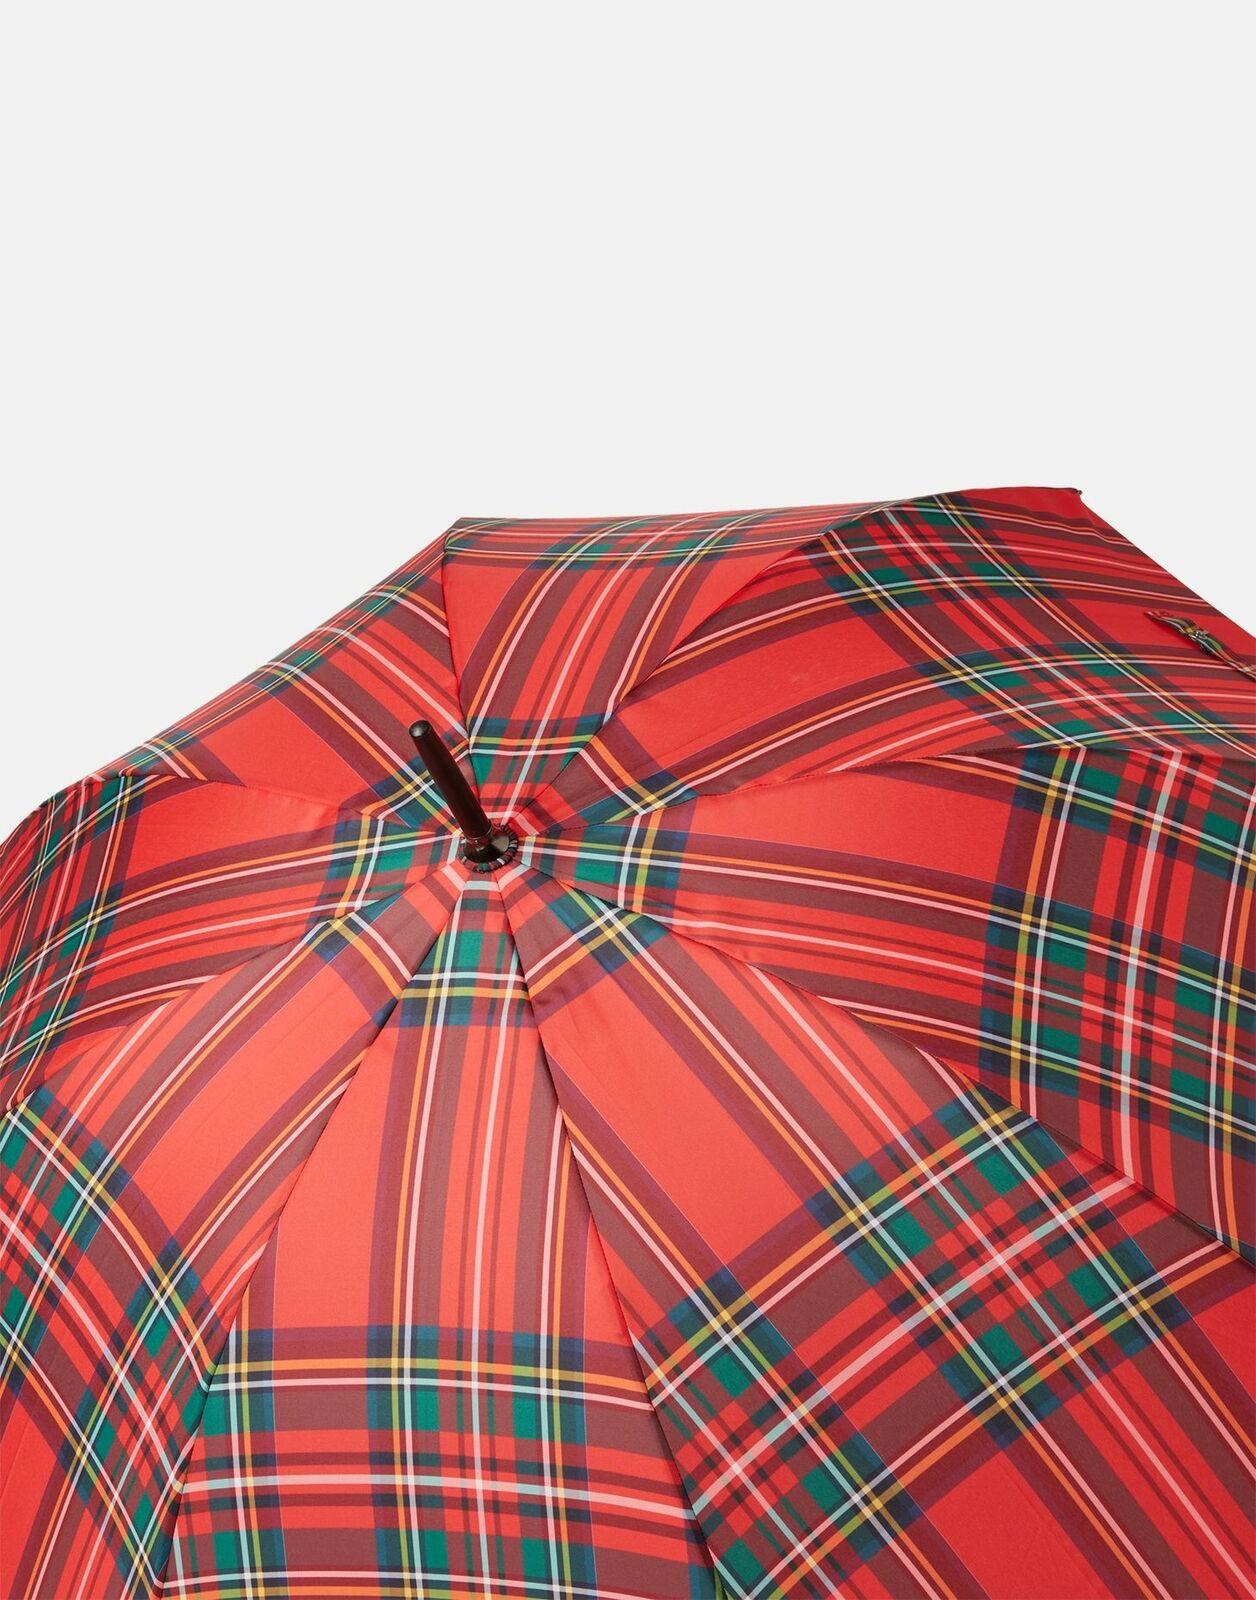 Joules Womens Kensington Walking Umbrella - Red Tartan - One Size